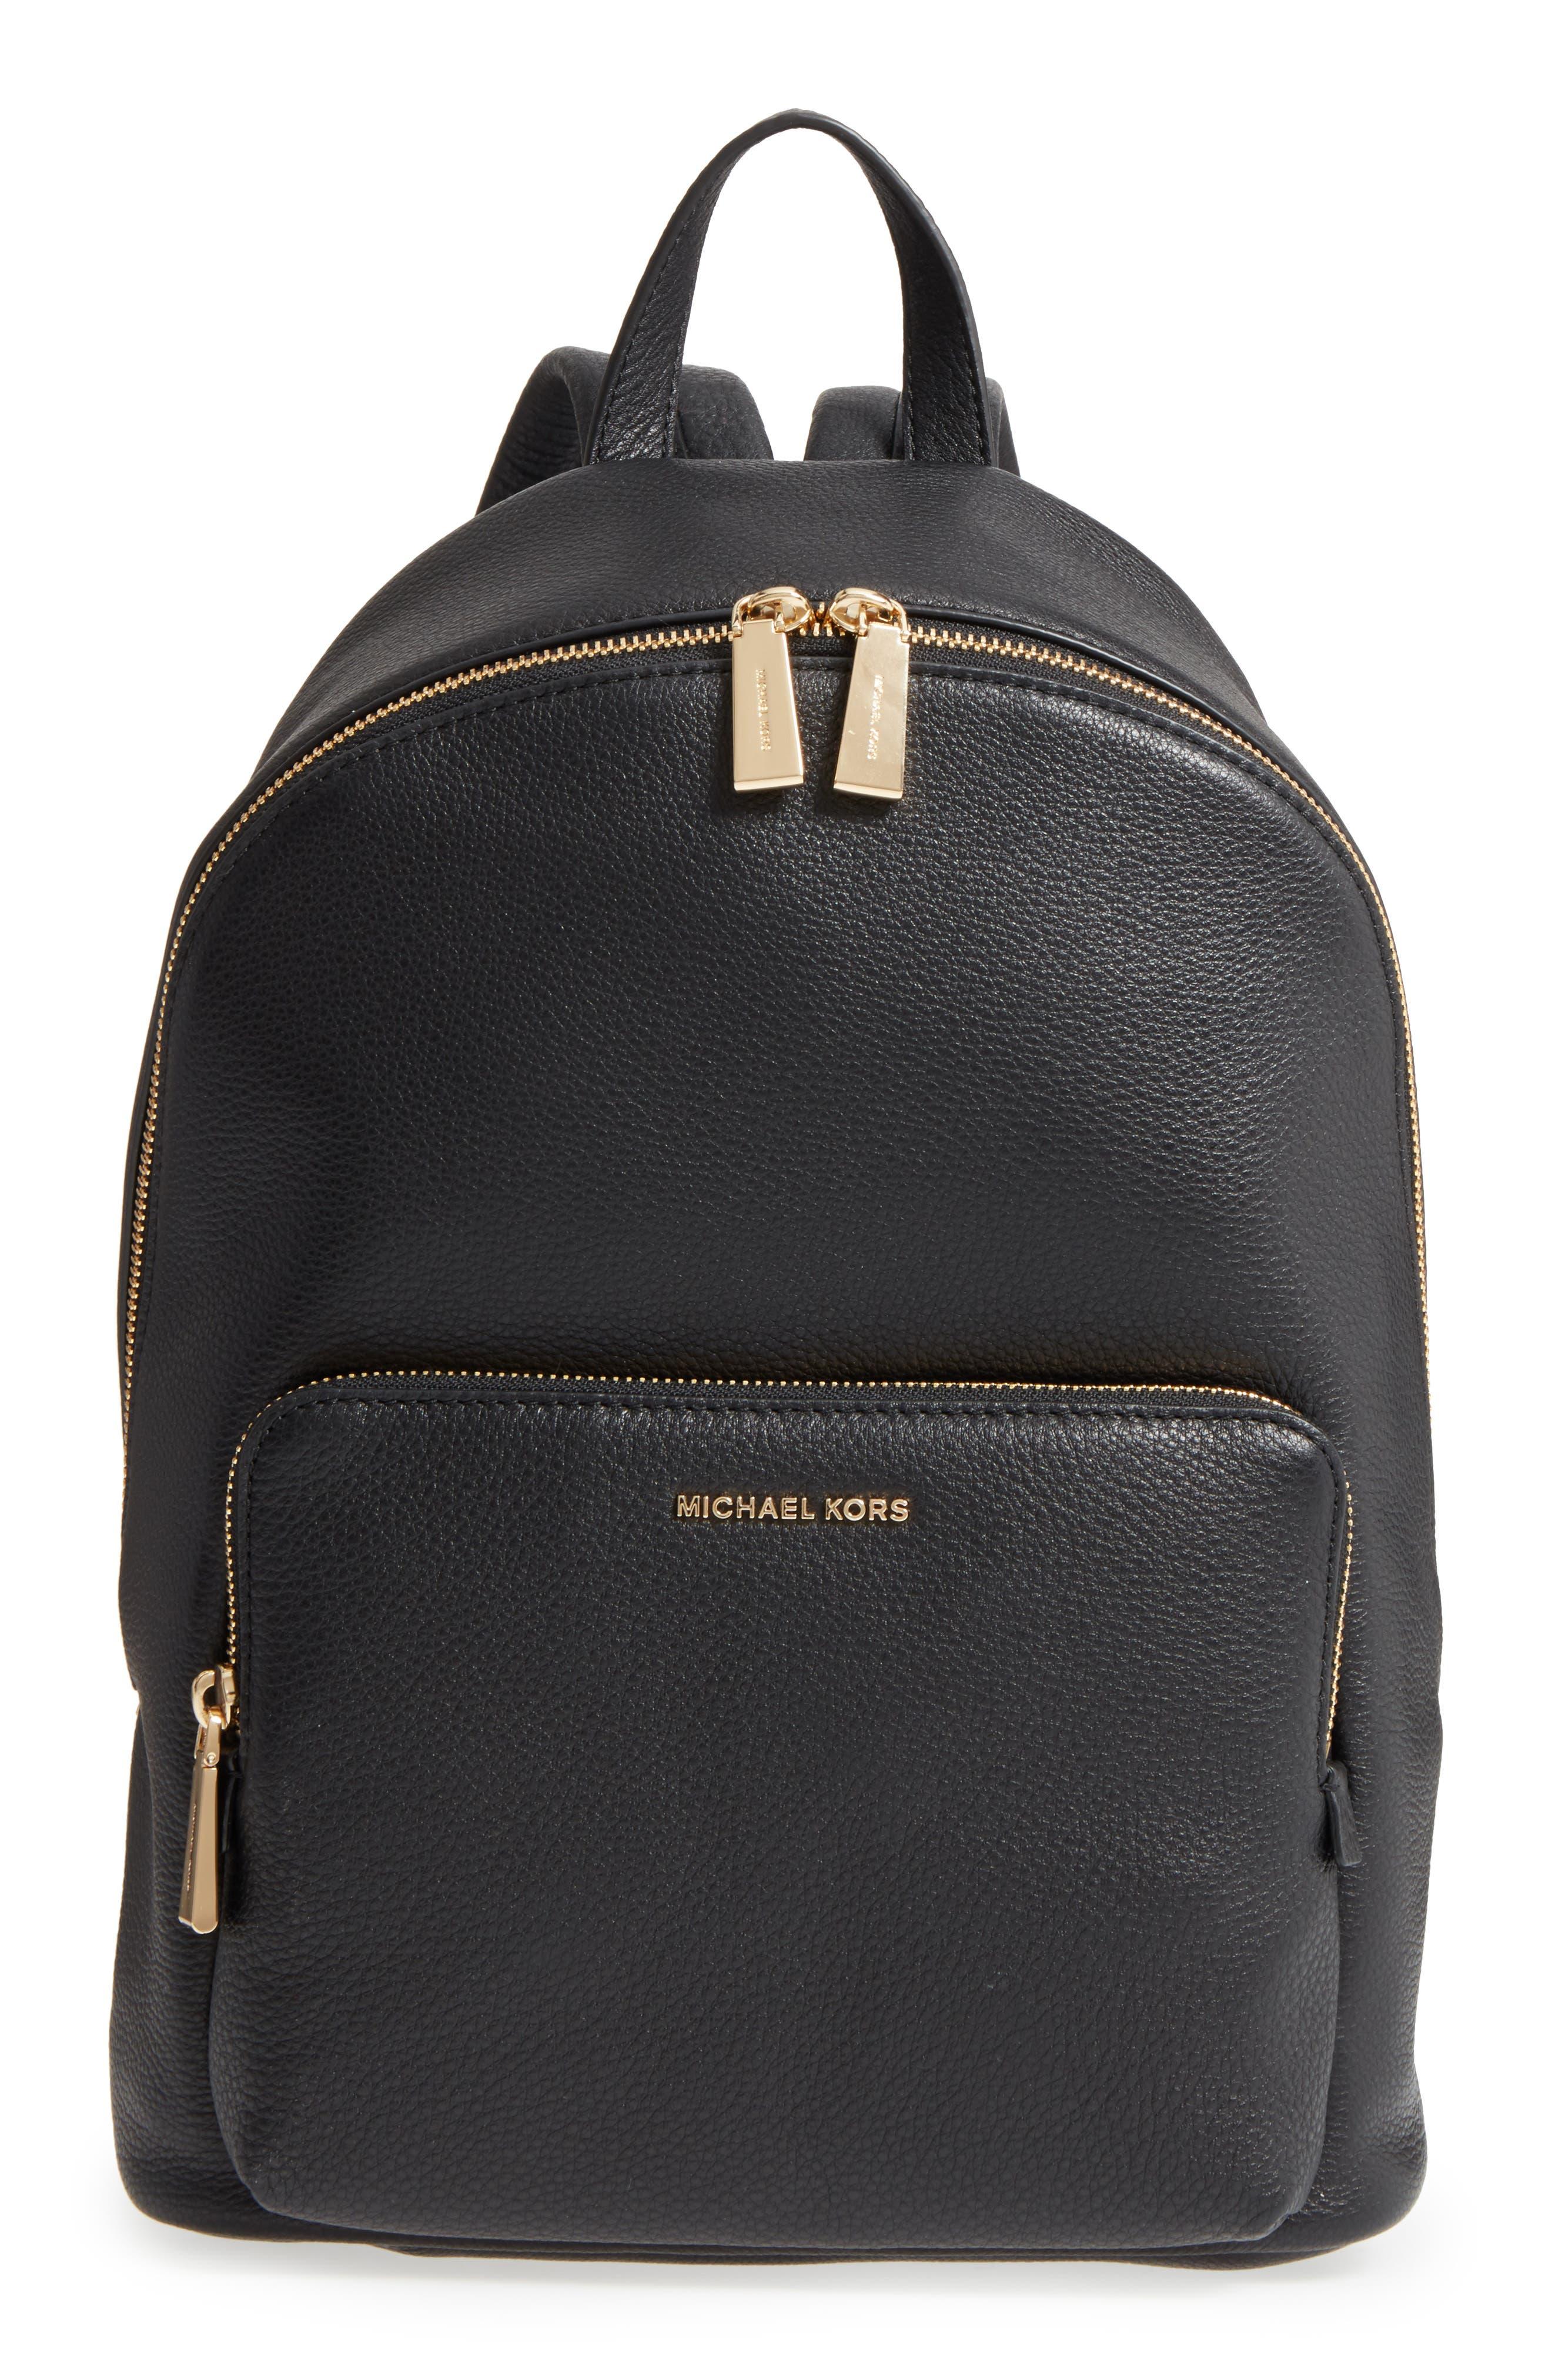 Main Image - Michael Kors Large Wythe Leather Backpack